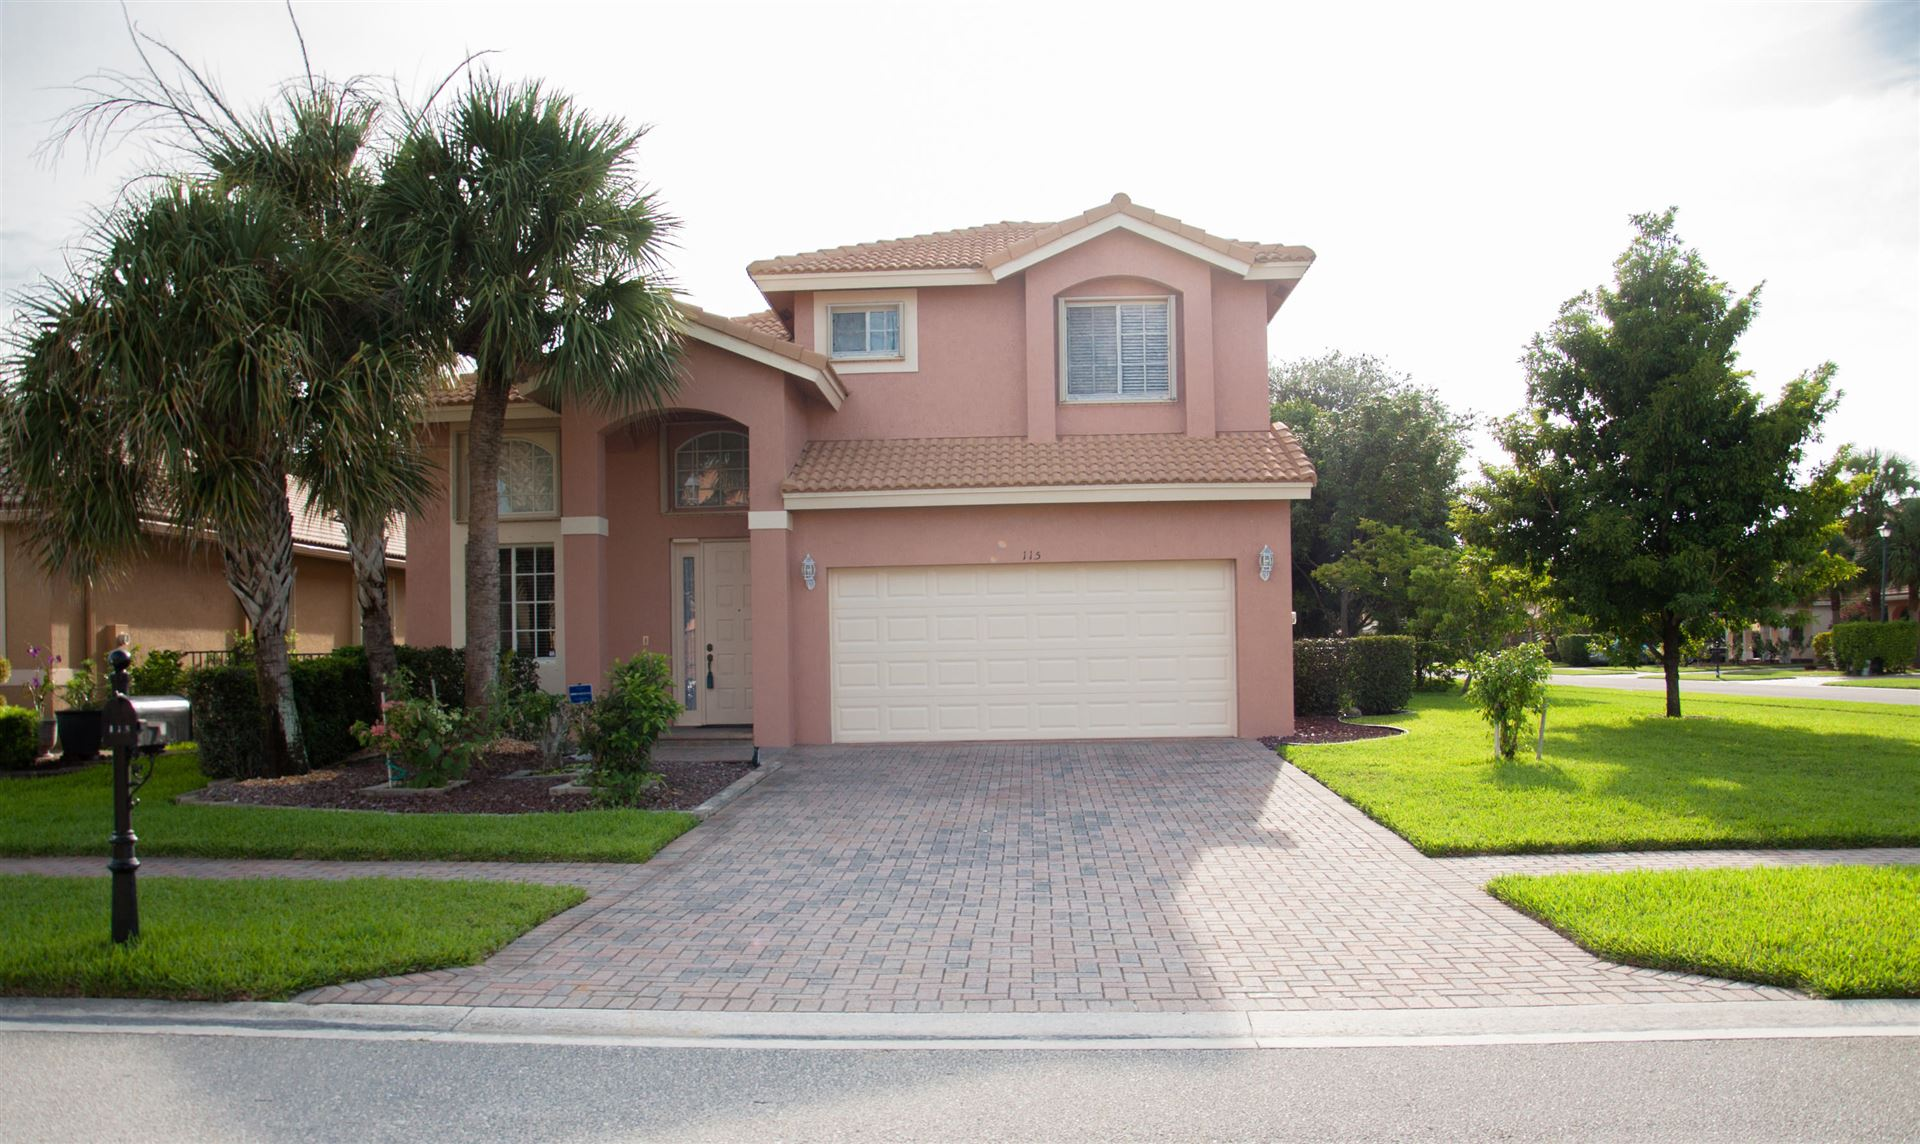 115 Sarona Circle, Royal Palm Beach, FL 33411 - MLS#: RX-10728640